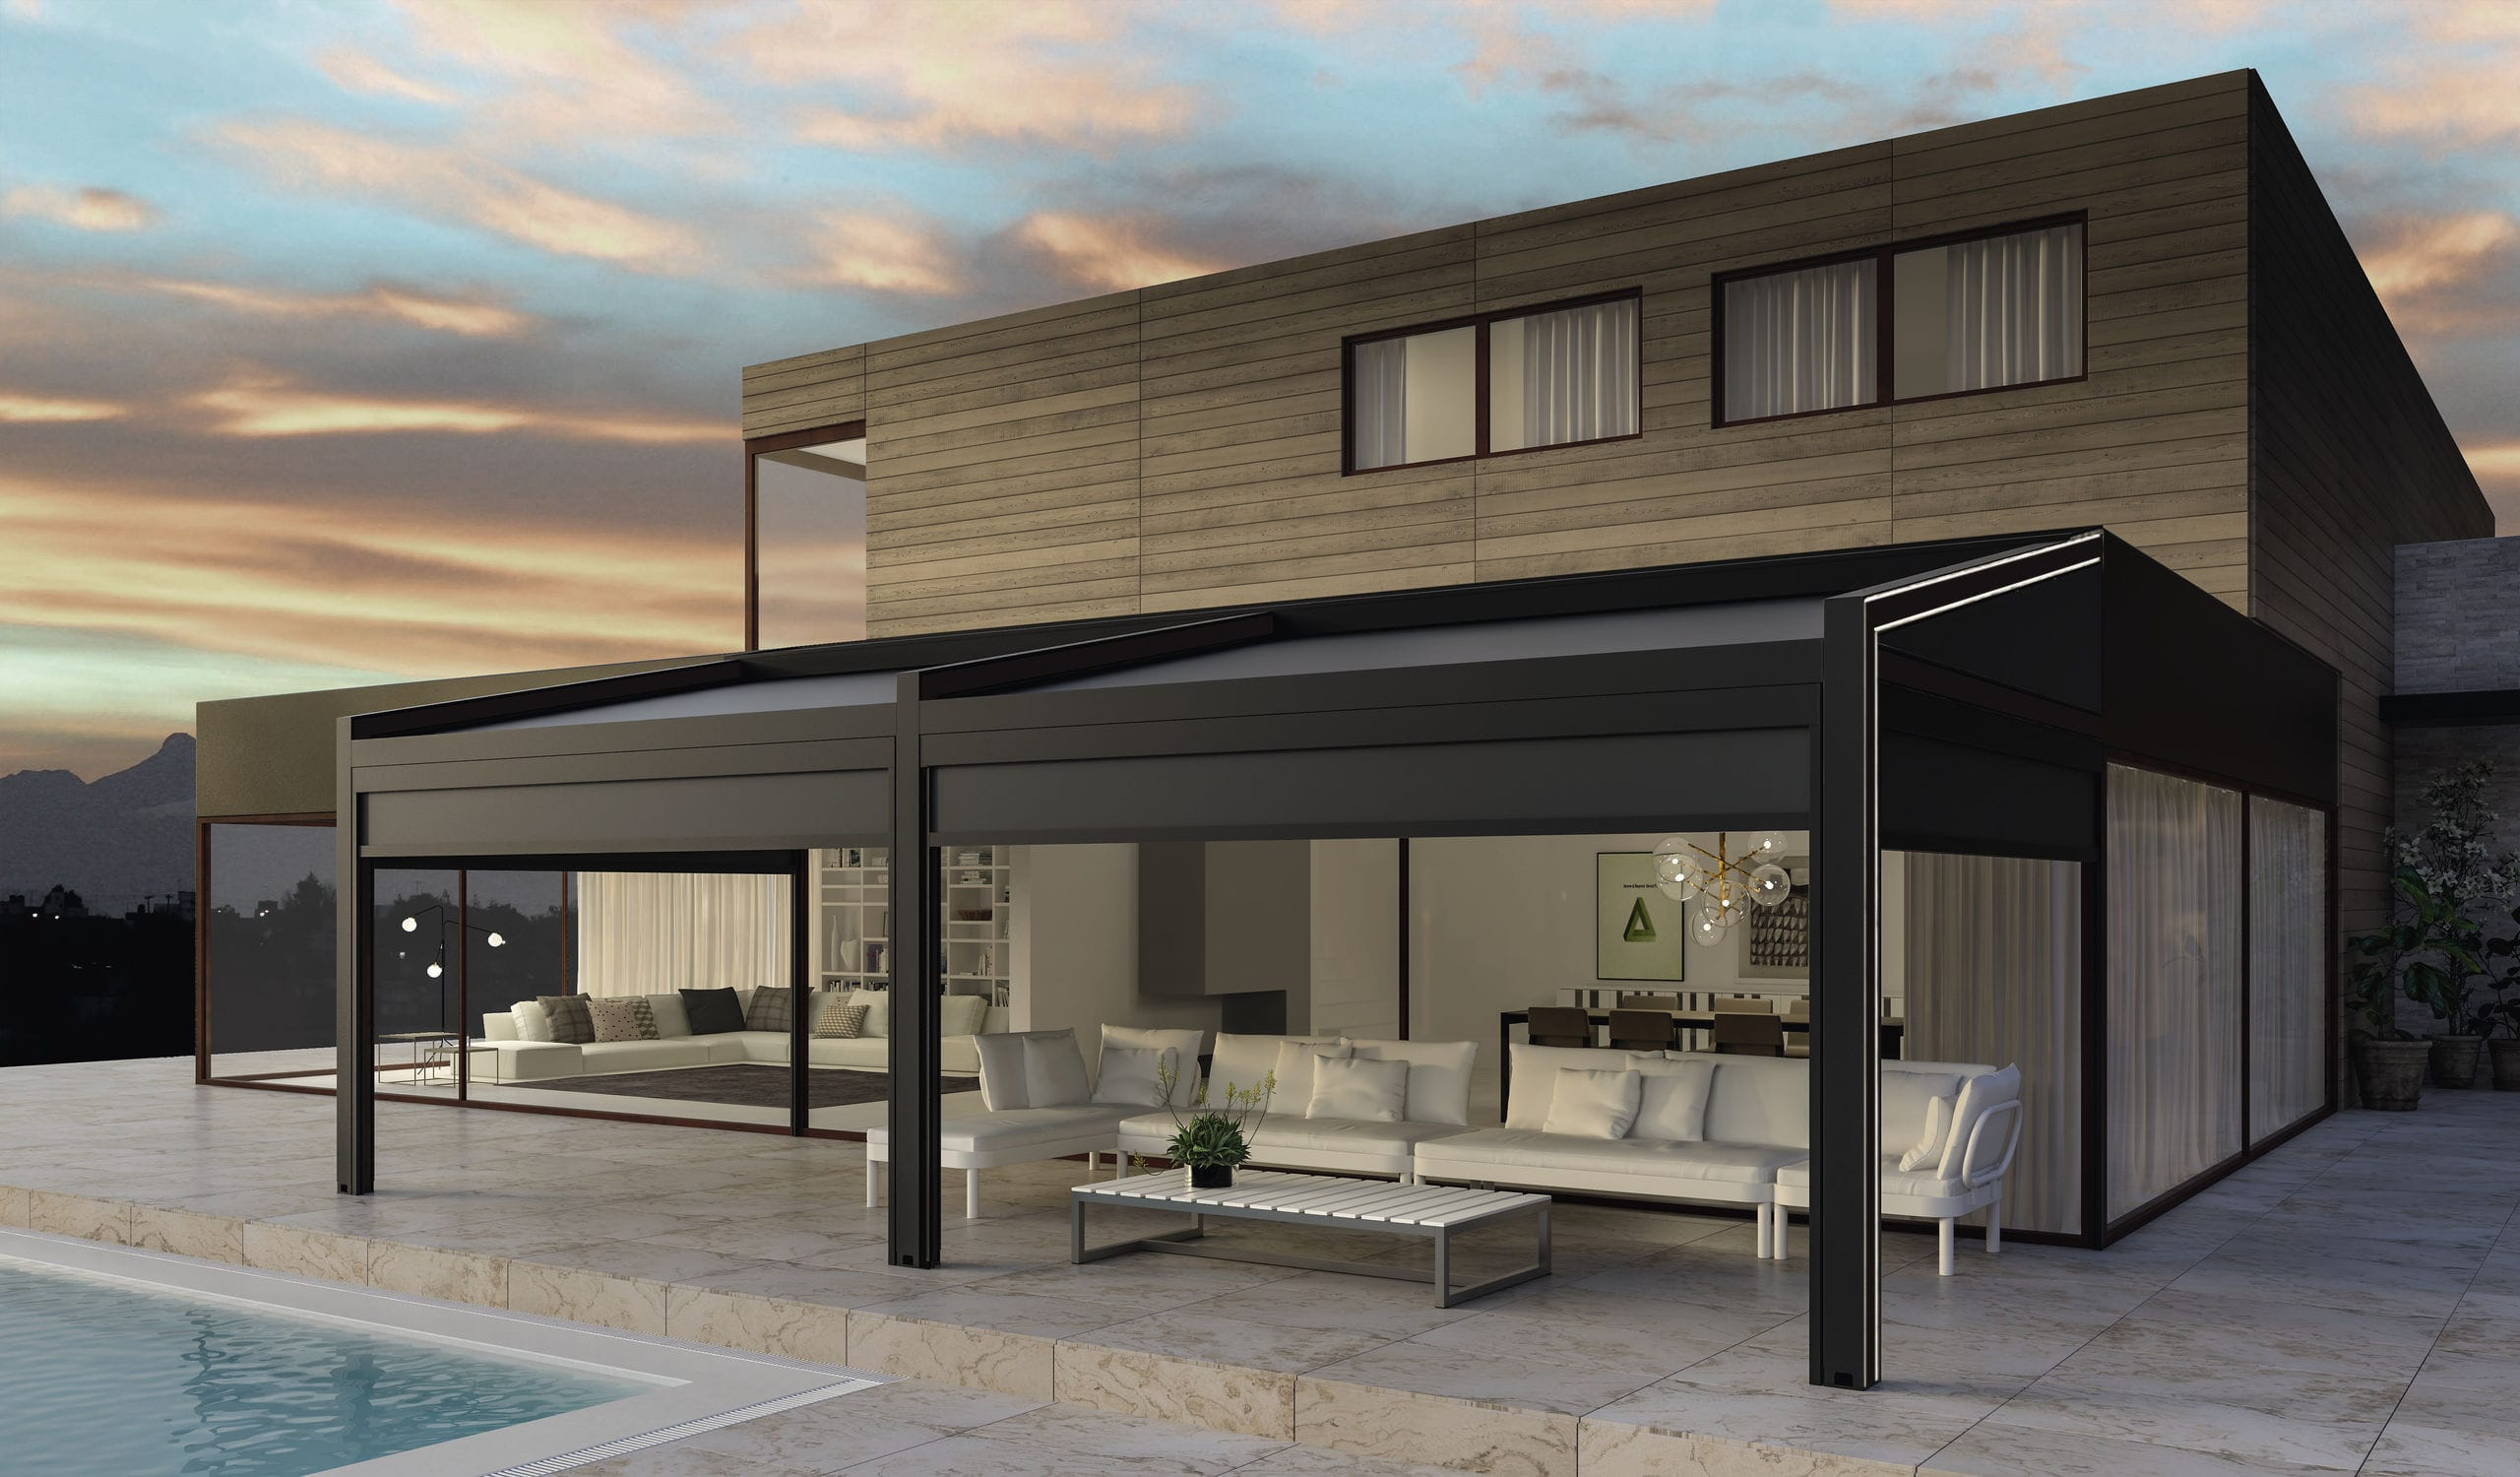 ... Wall-mounted pergola / aluminum / fabric sliding canopy / bioclimatic VEGA KE Outdoor Design ... & Wall-mounted pergola / aluminum / fabric sliding canopy ...